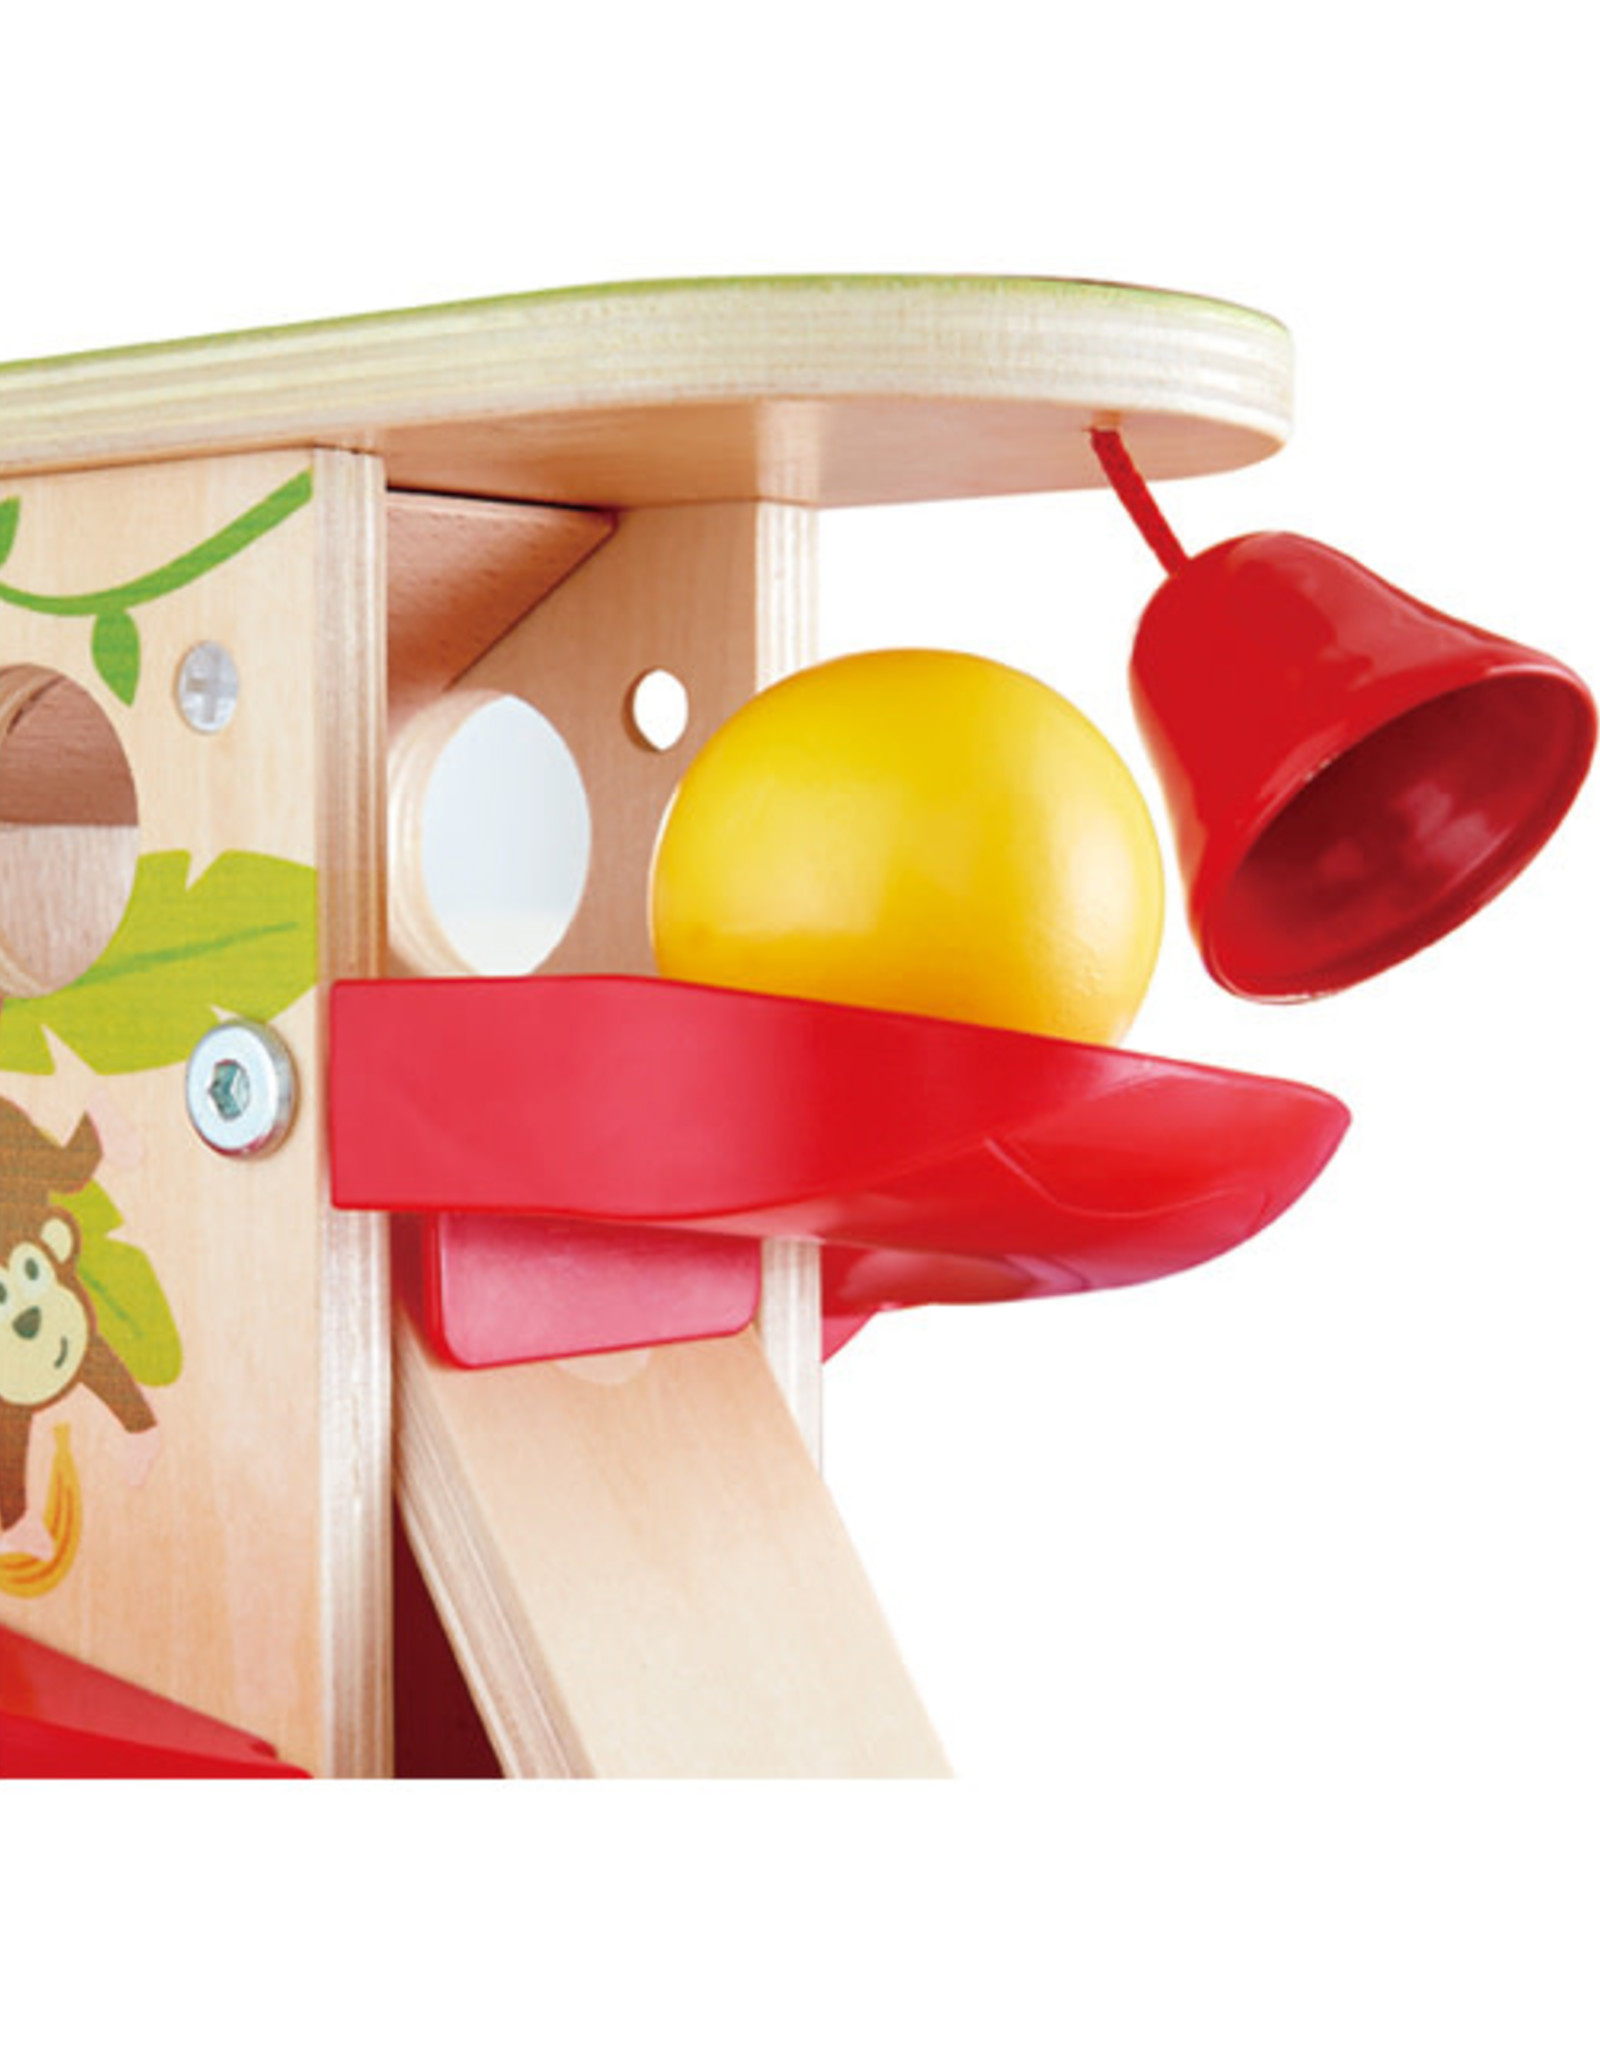 Hape Toys Hape Jungle Press and Slide